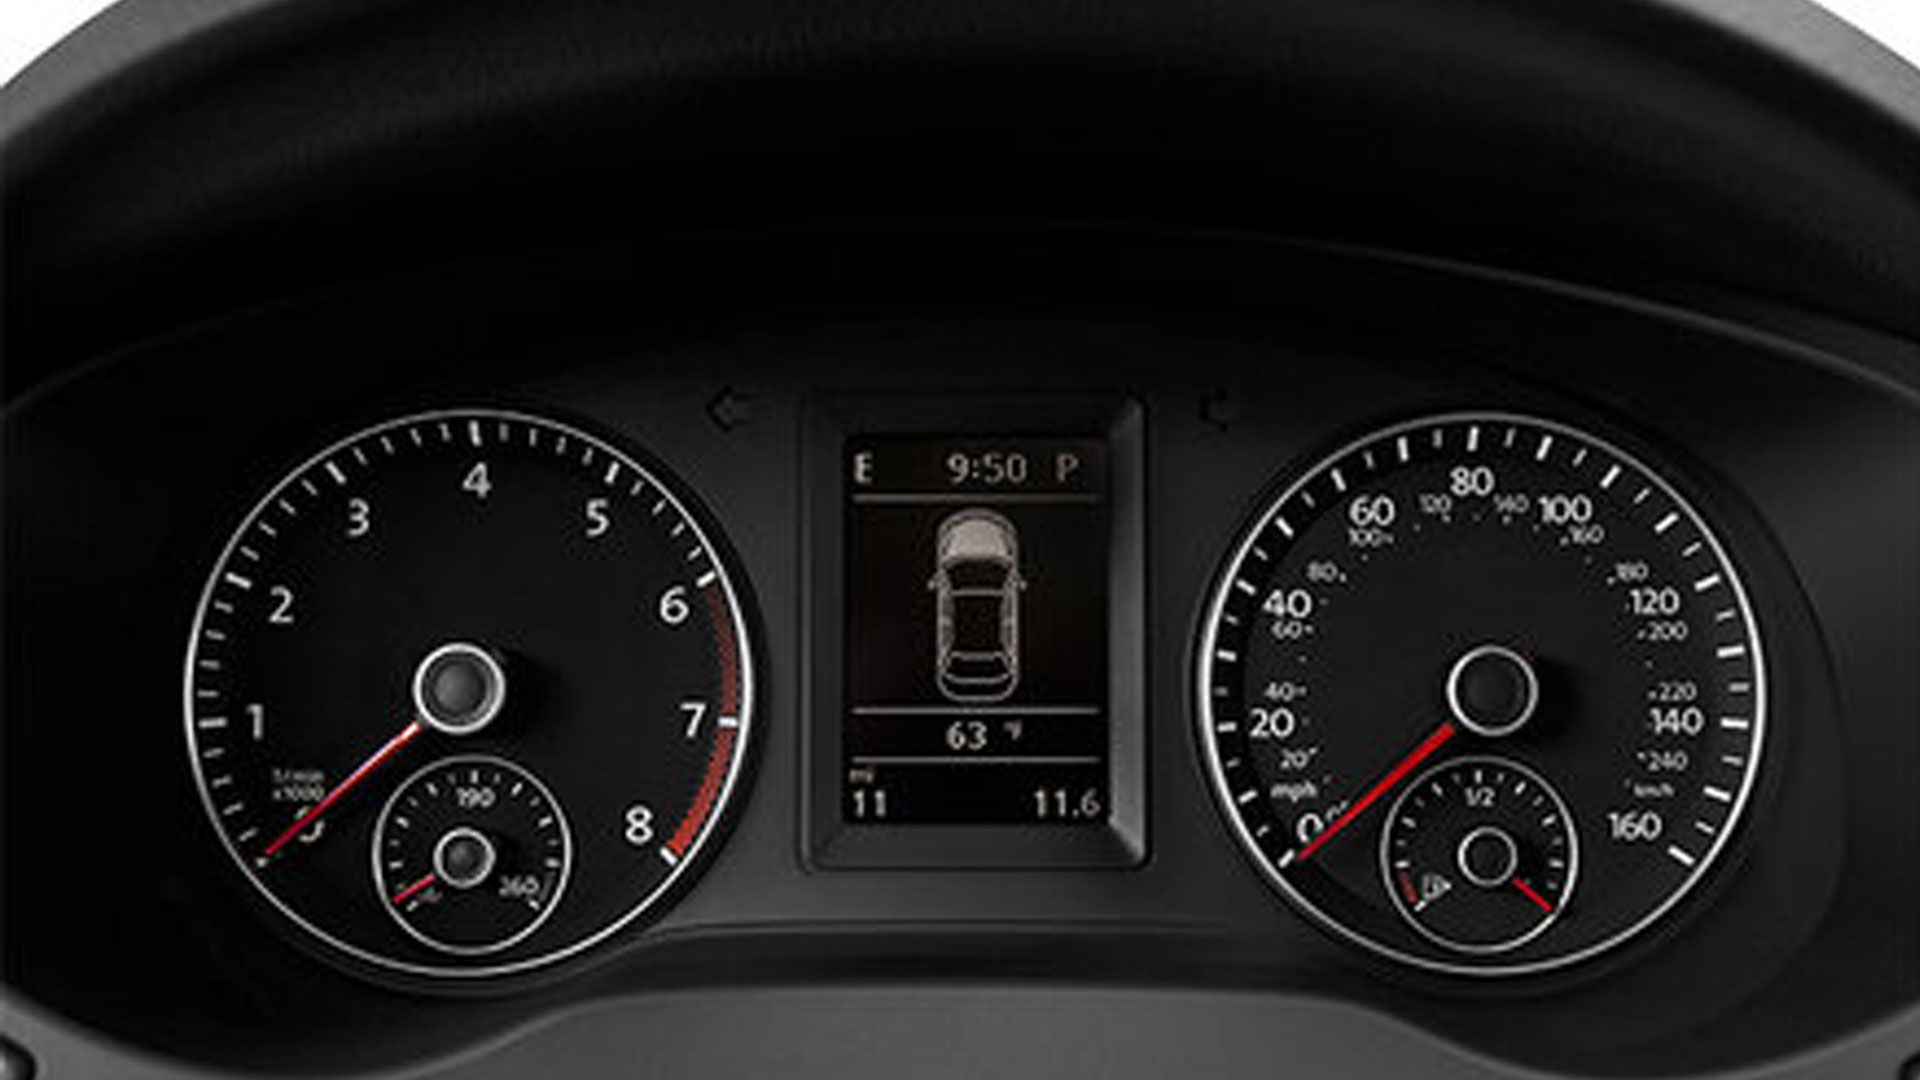 2014 Volkswagen Jetta GLI display 2014 Volkswagen Jetta